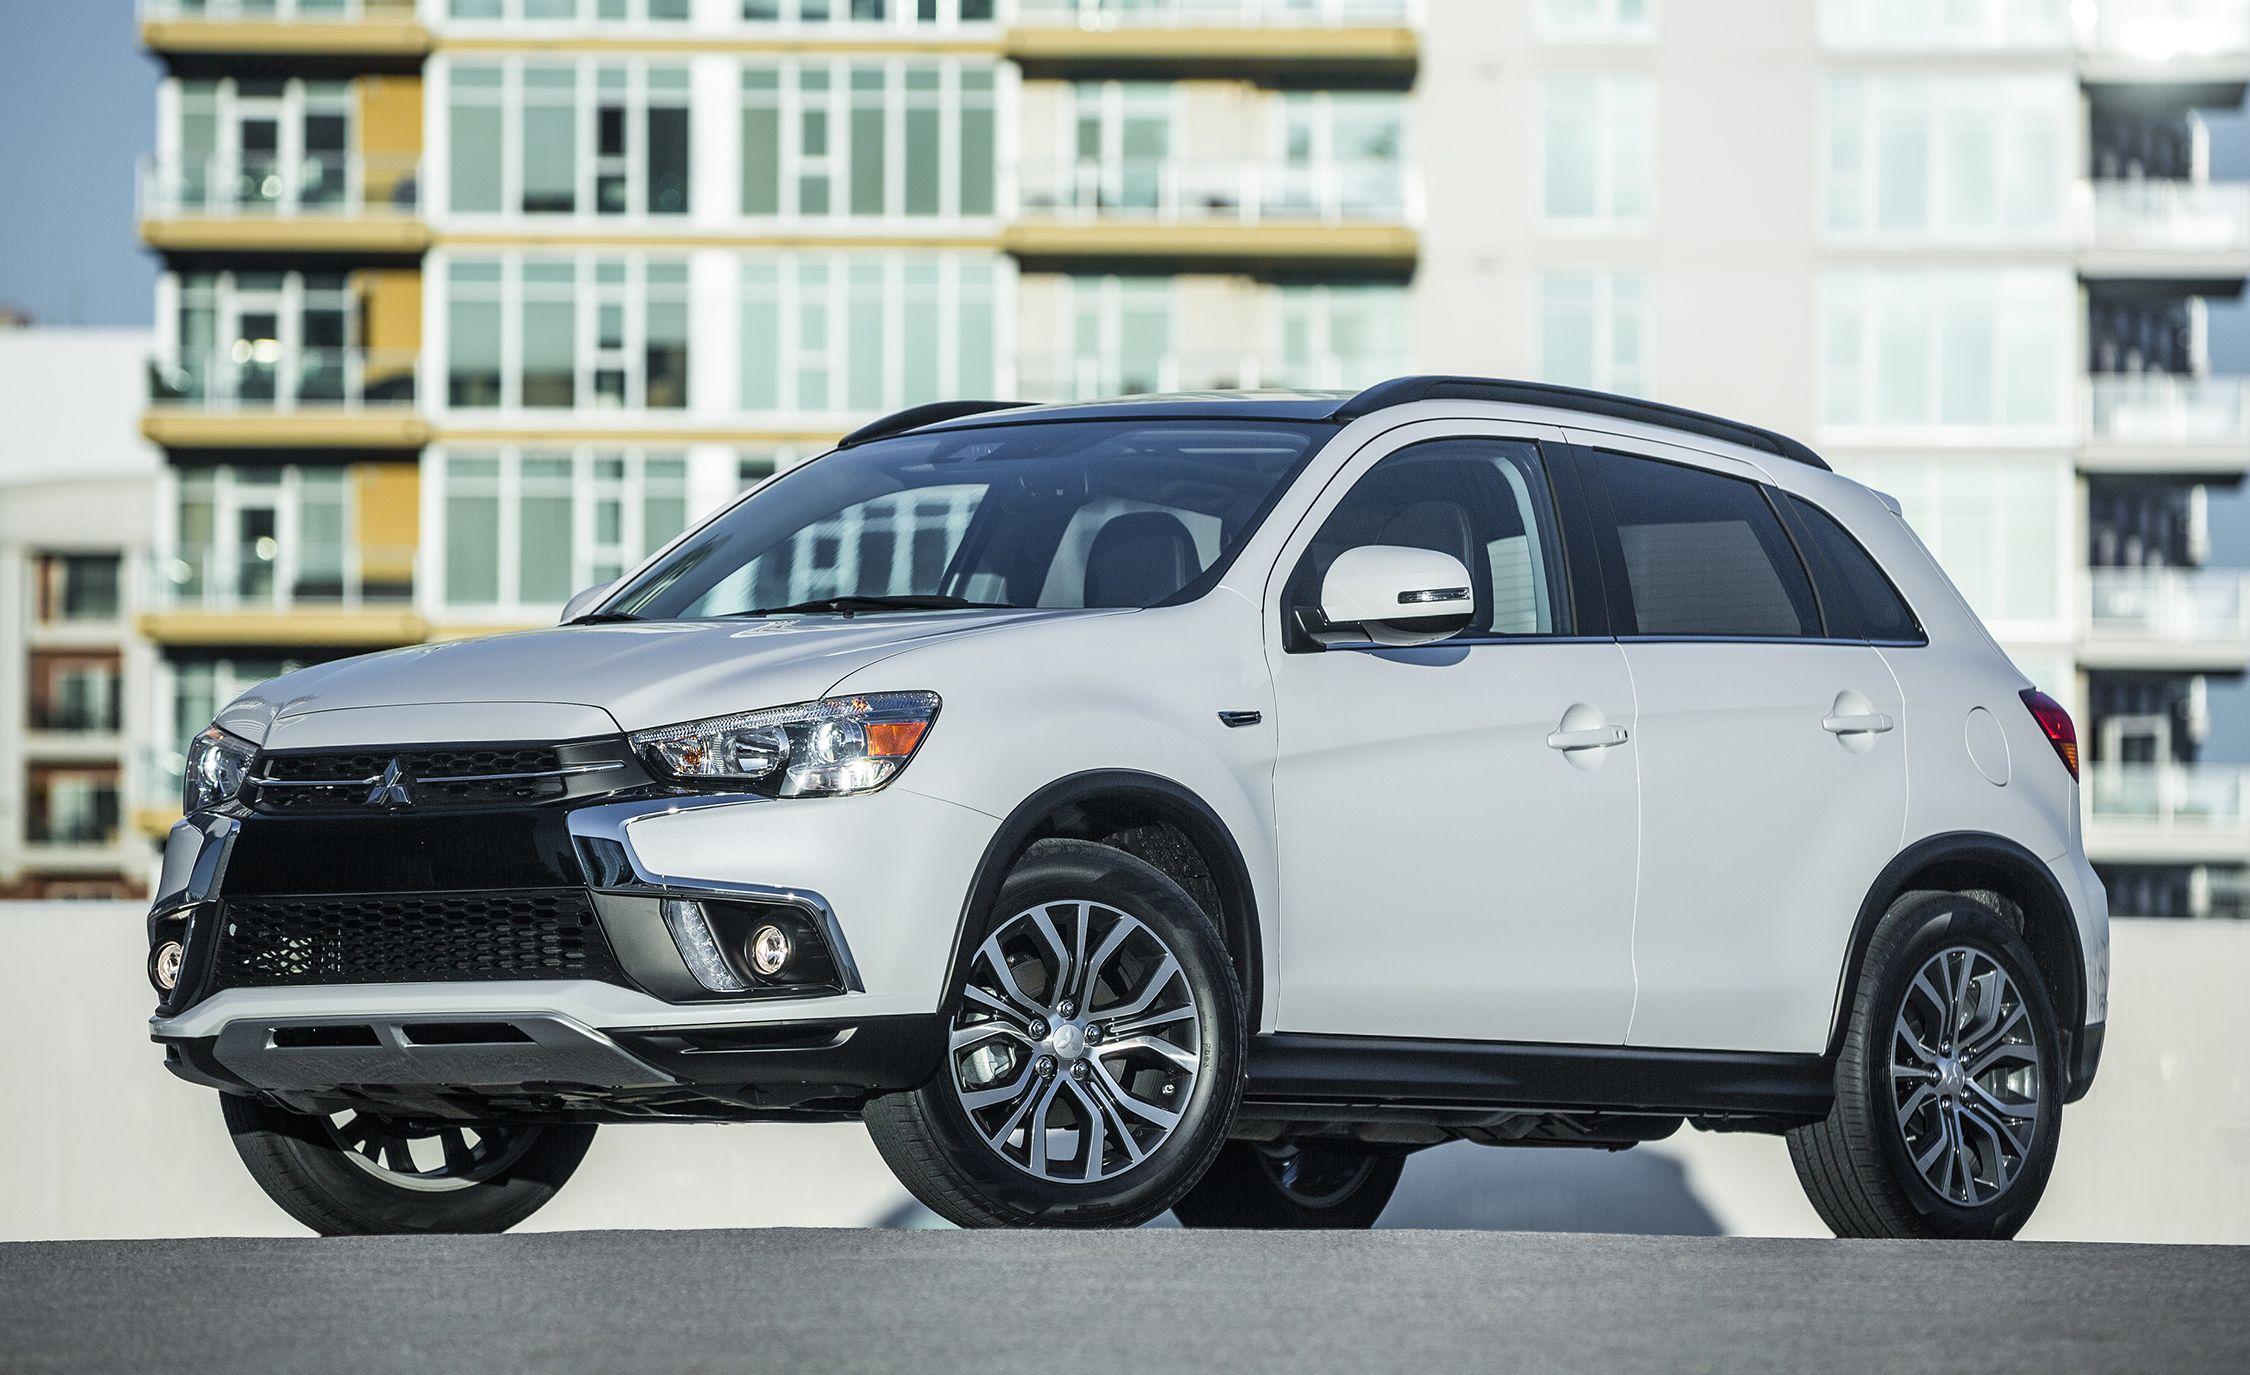 2018 Mitsubishi Outlander Sport: New Look, New Tech